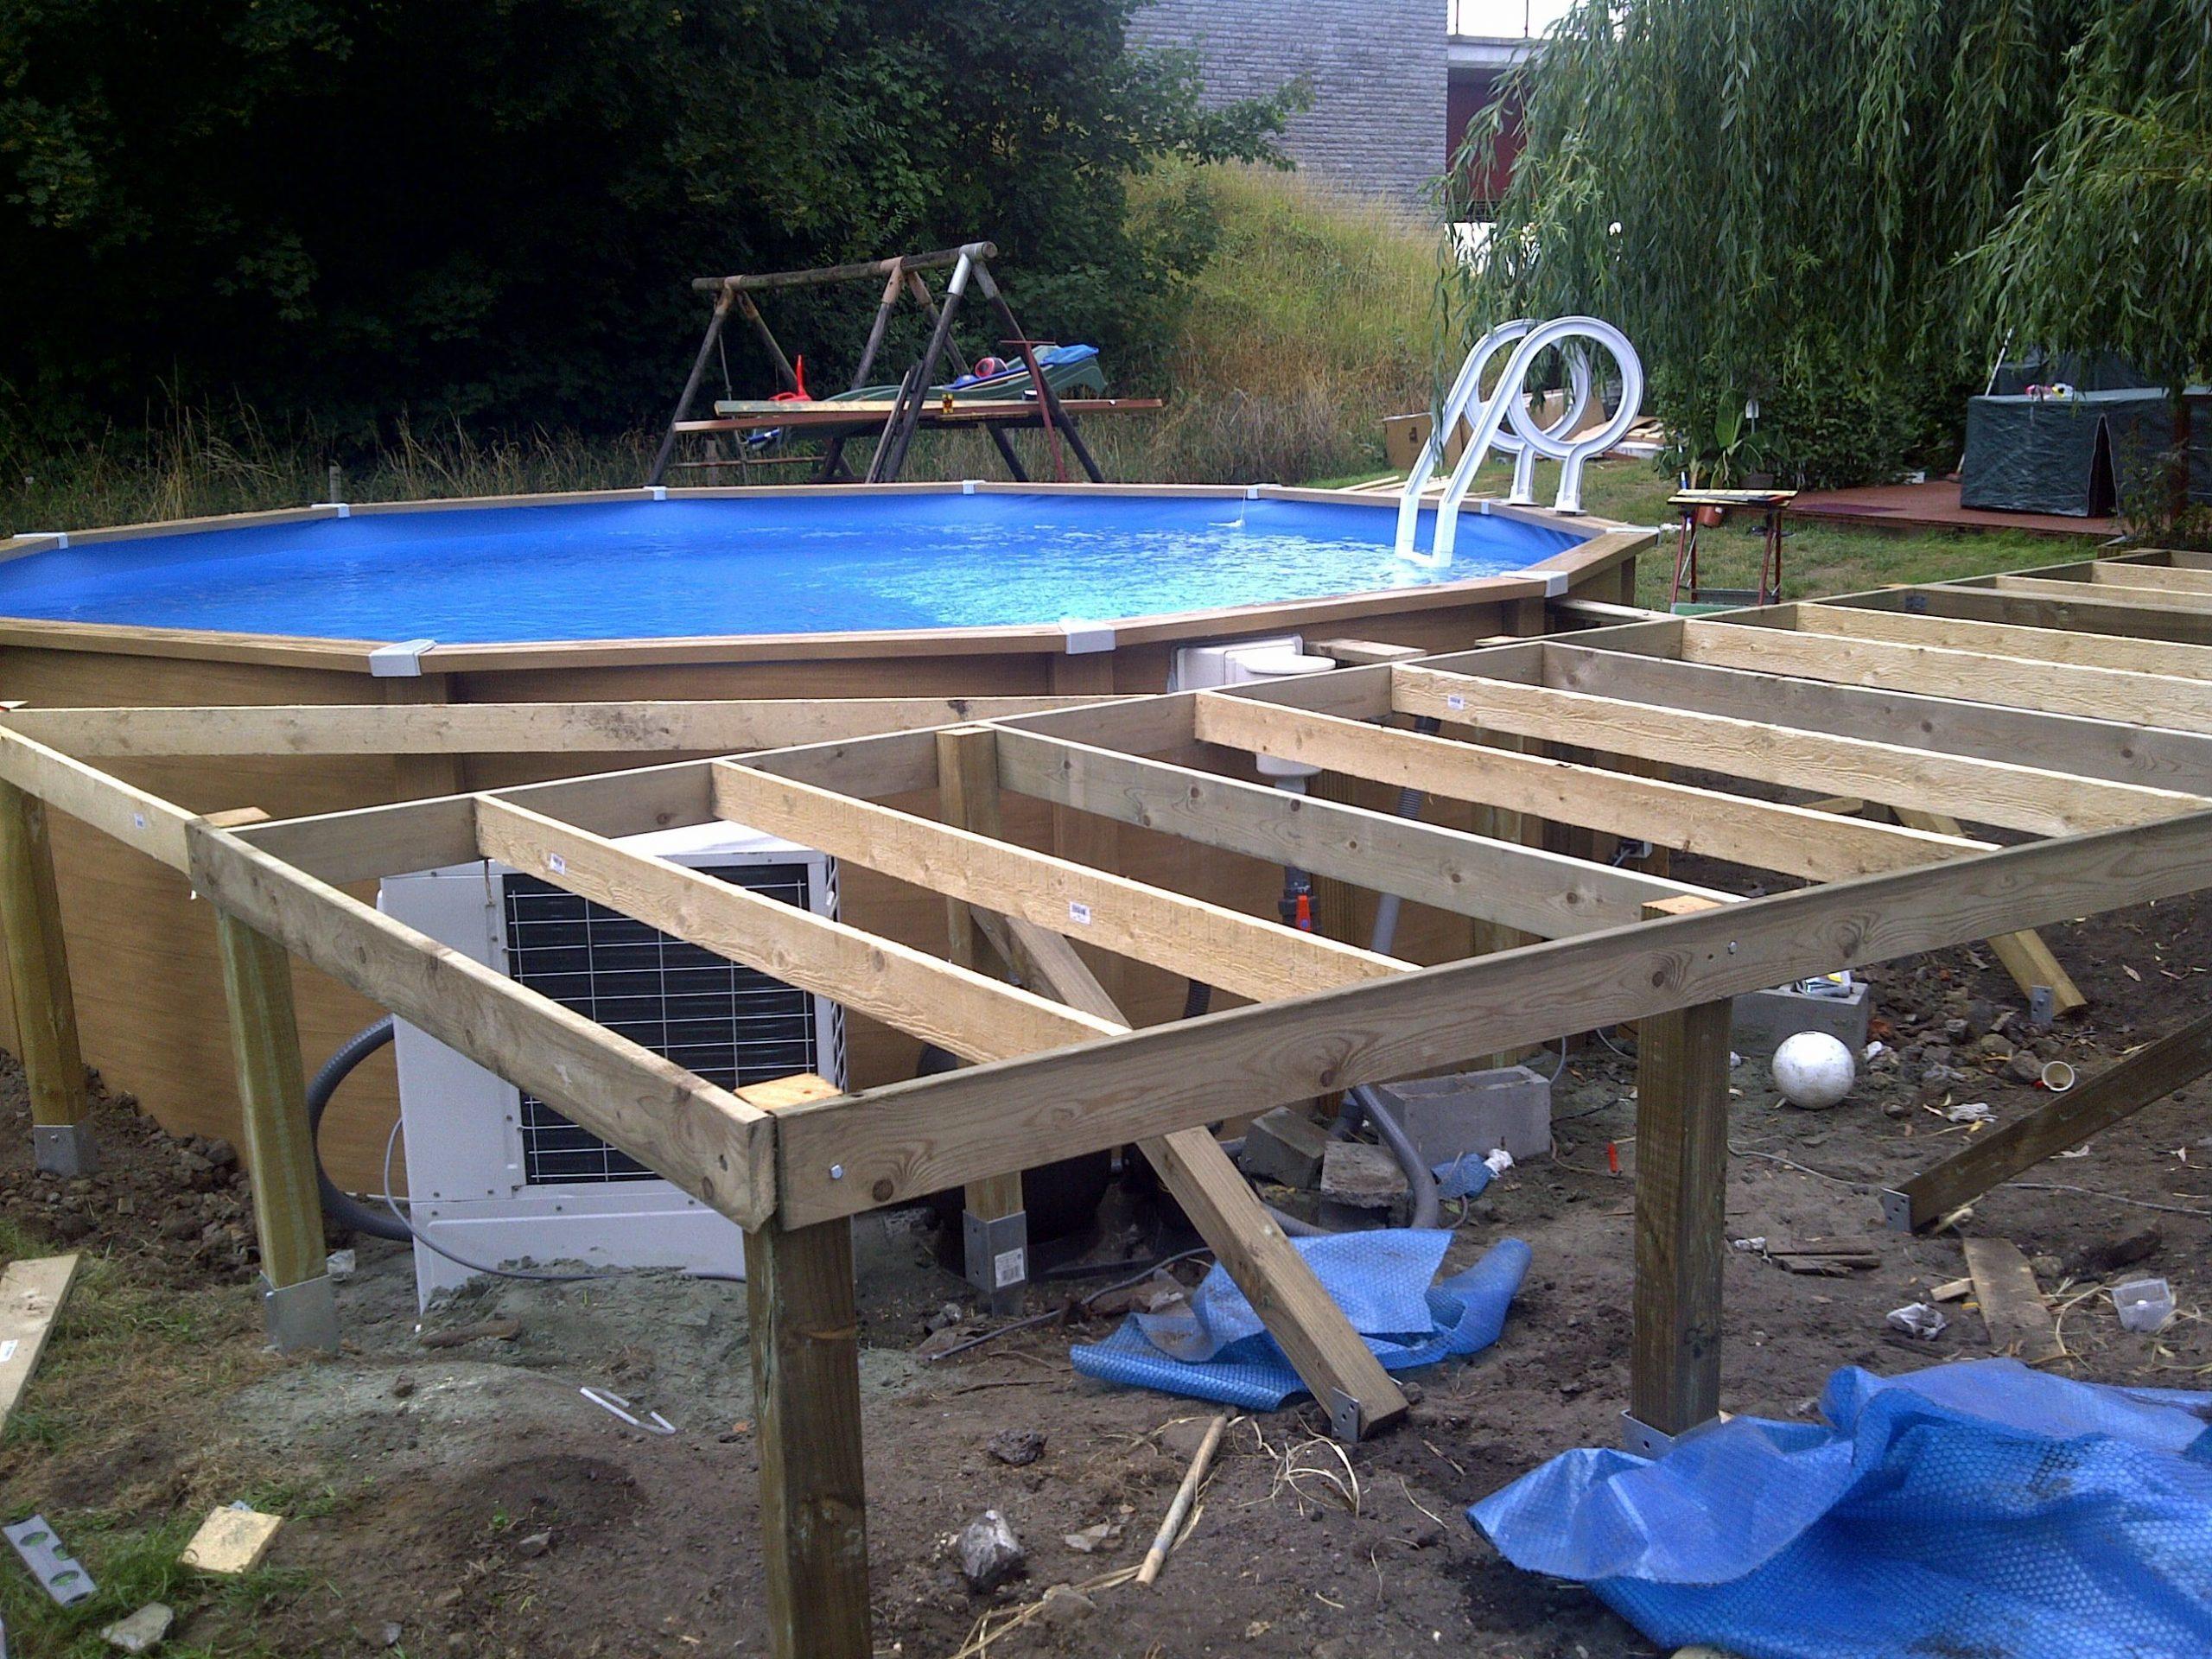 Terrasse-Piscine-Tubulaire-2.jpg (2592×1944) | Zahrada, Bazén destiné Dalle Piscine Castorama